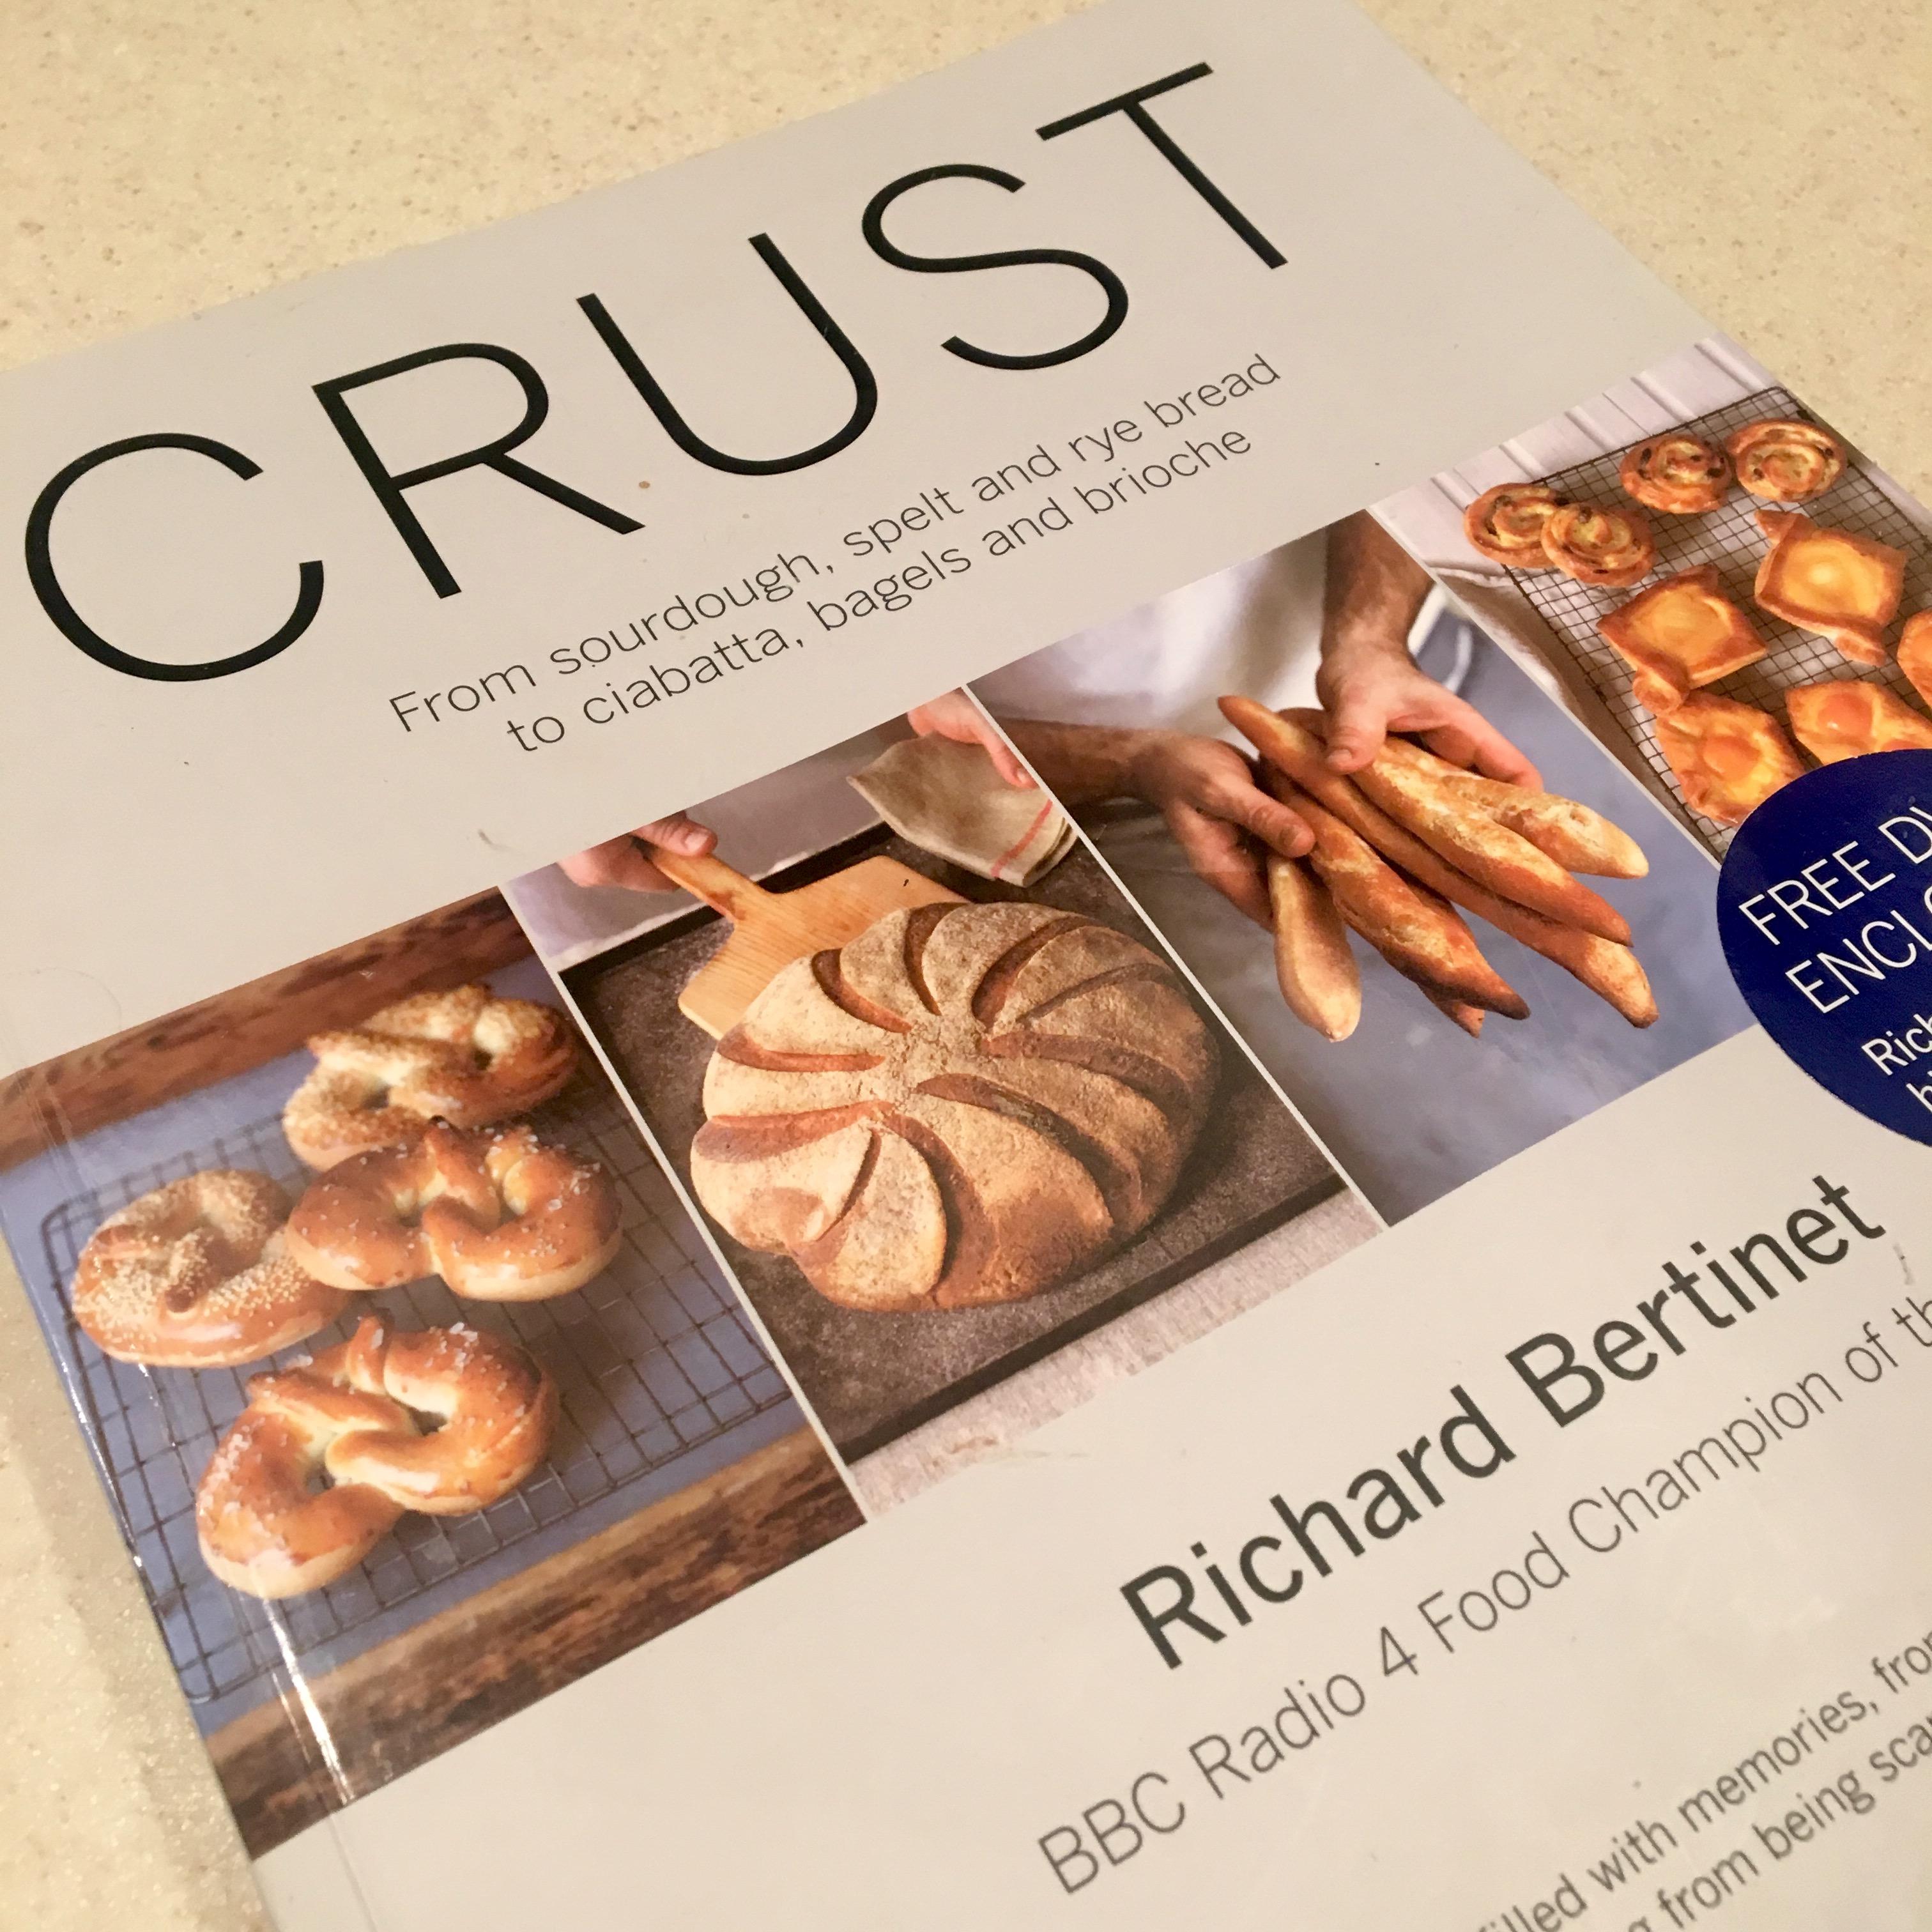 crust.jpeg